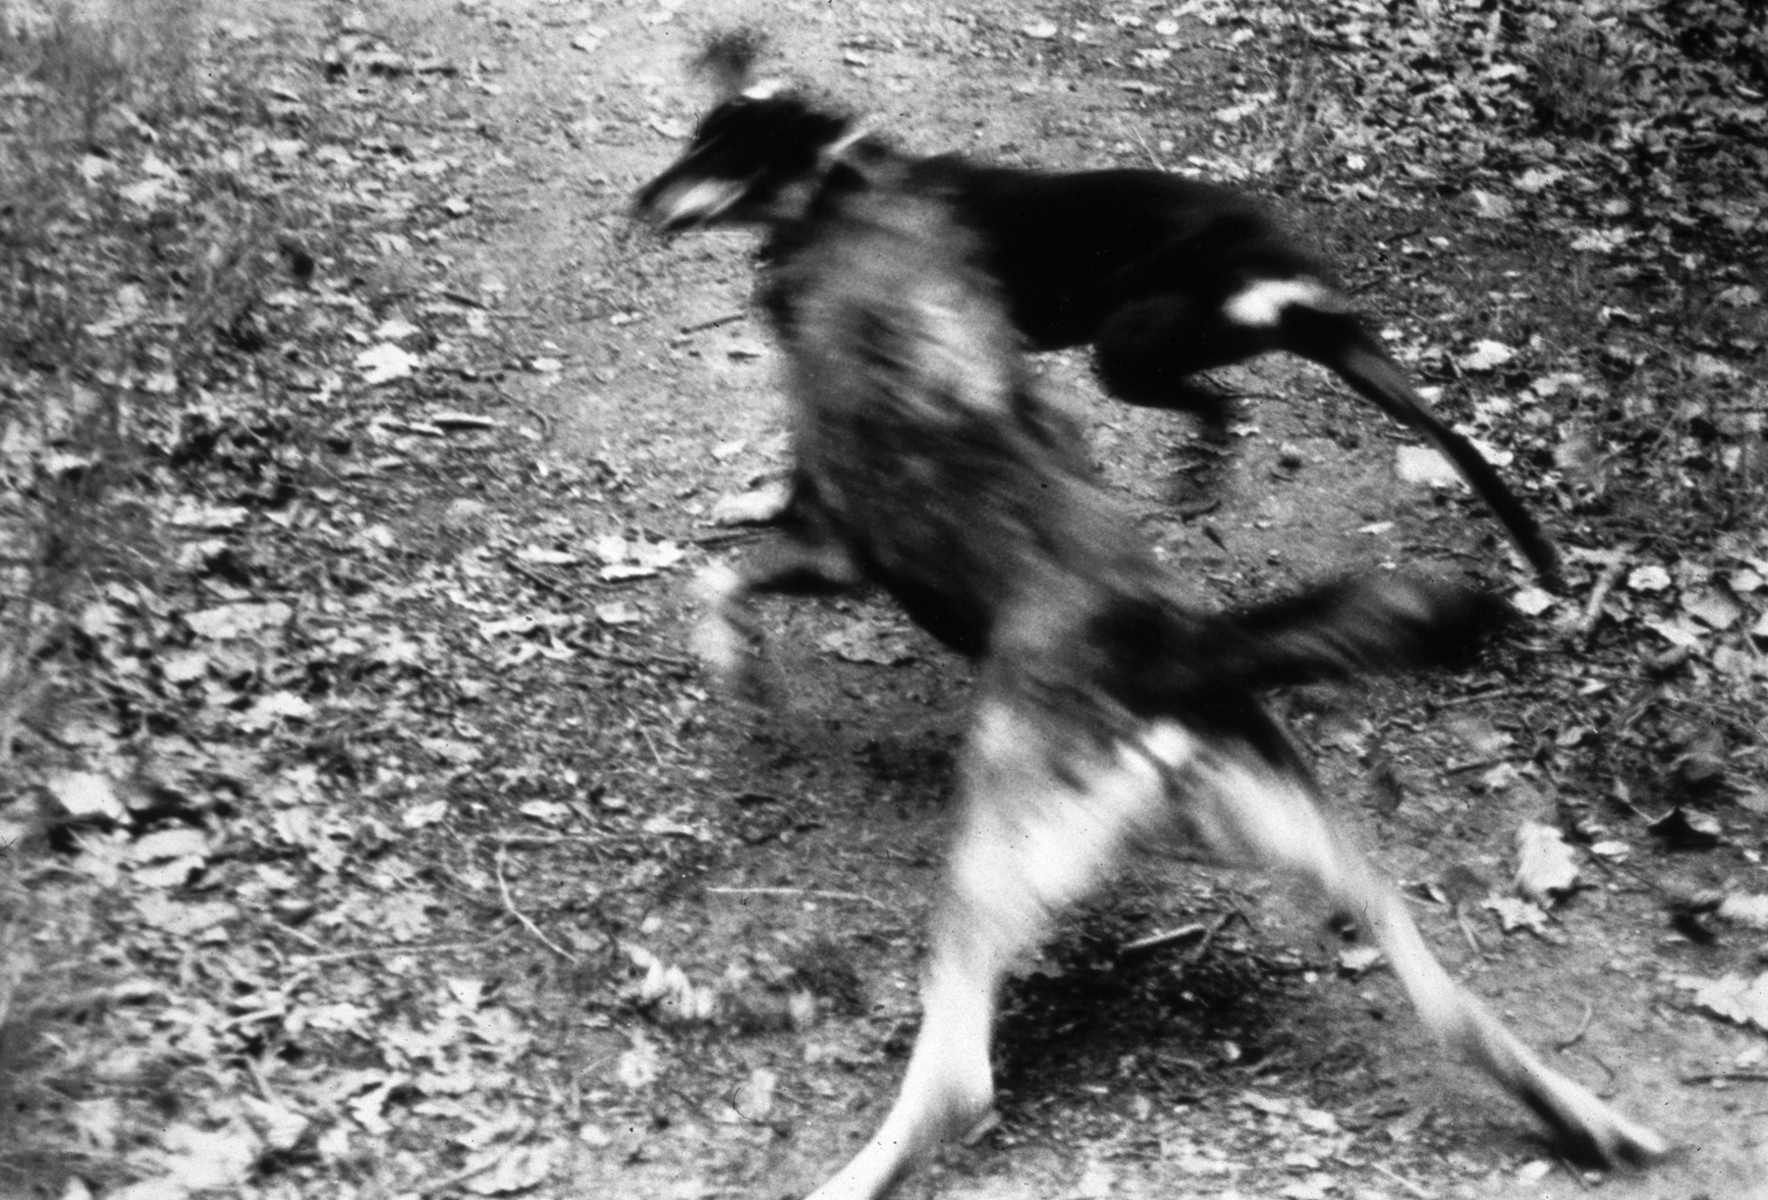 Dogs No.4